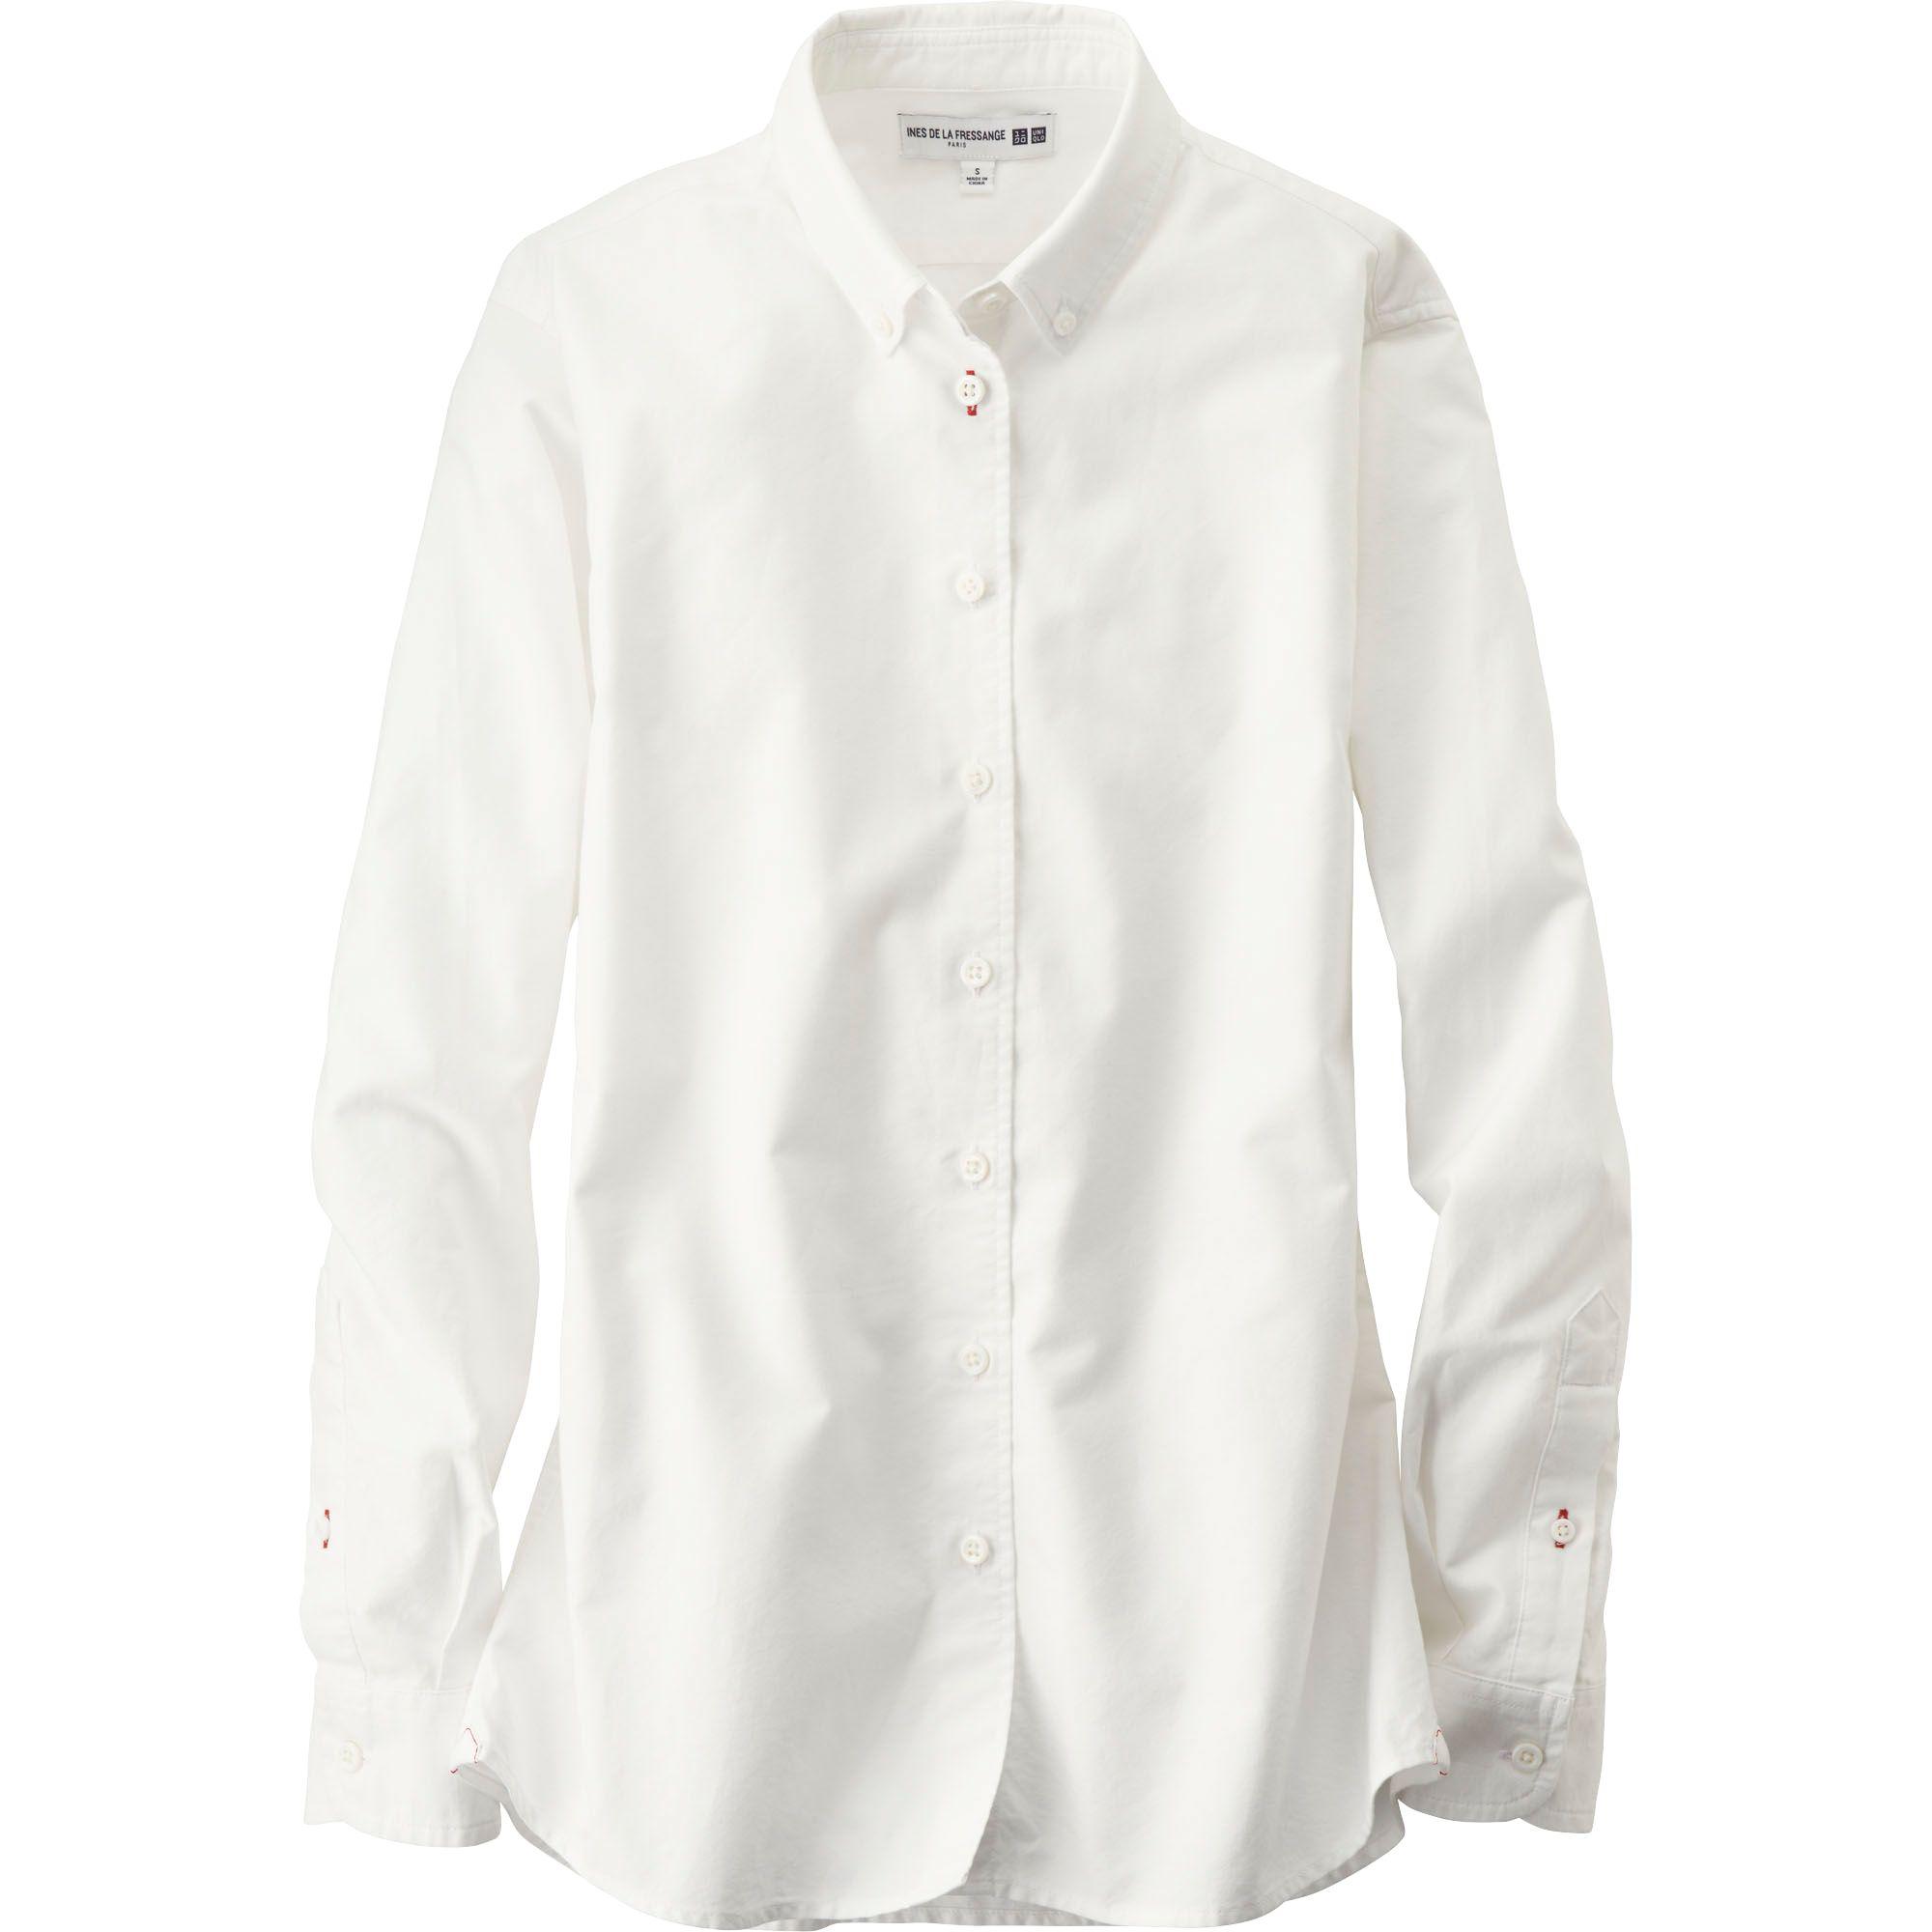 Uniqlo Women Idlf Oxford Basic Long Sleeve Shirt In White